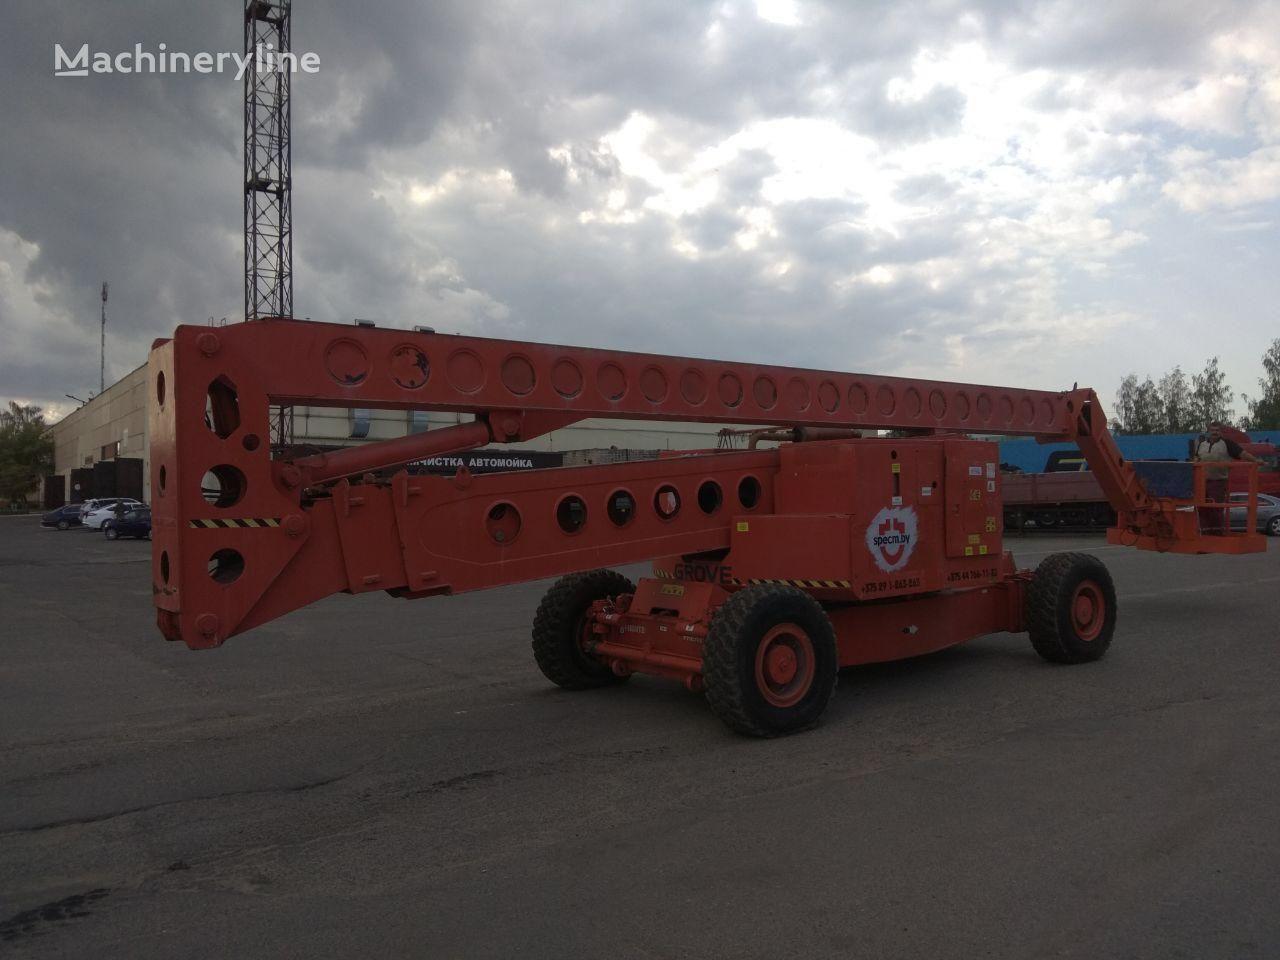 GROVE A125J articulated boom lift